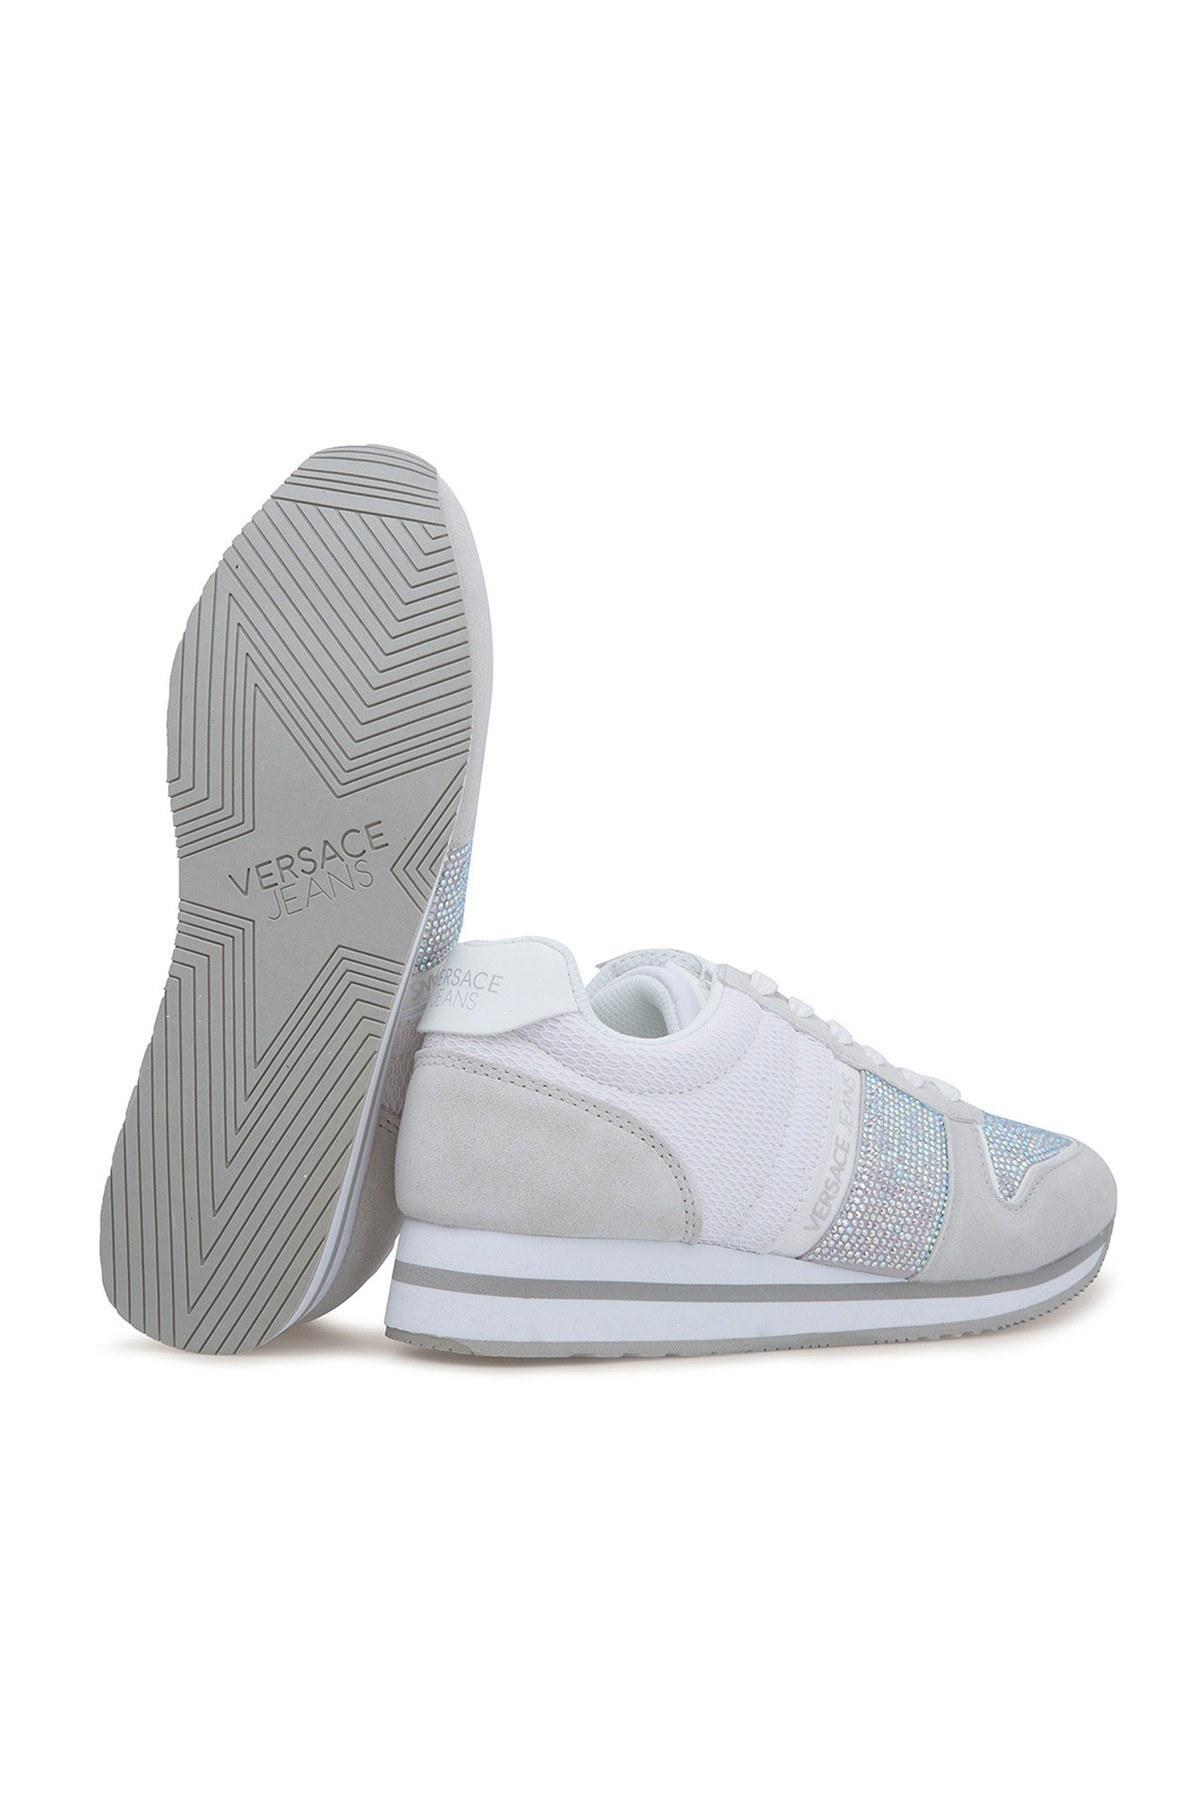 Versace Jeans Bayan Ayakkabı E0VTBSA1 70897 003 BEYAZ